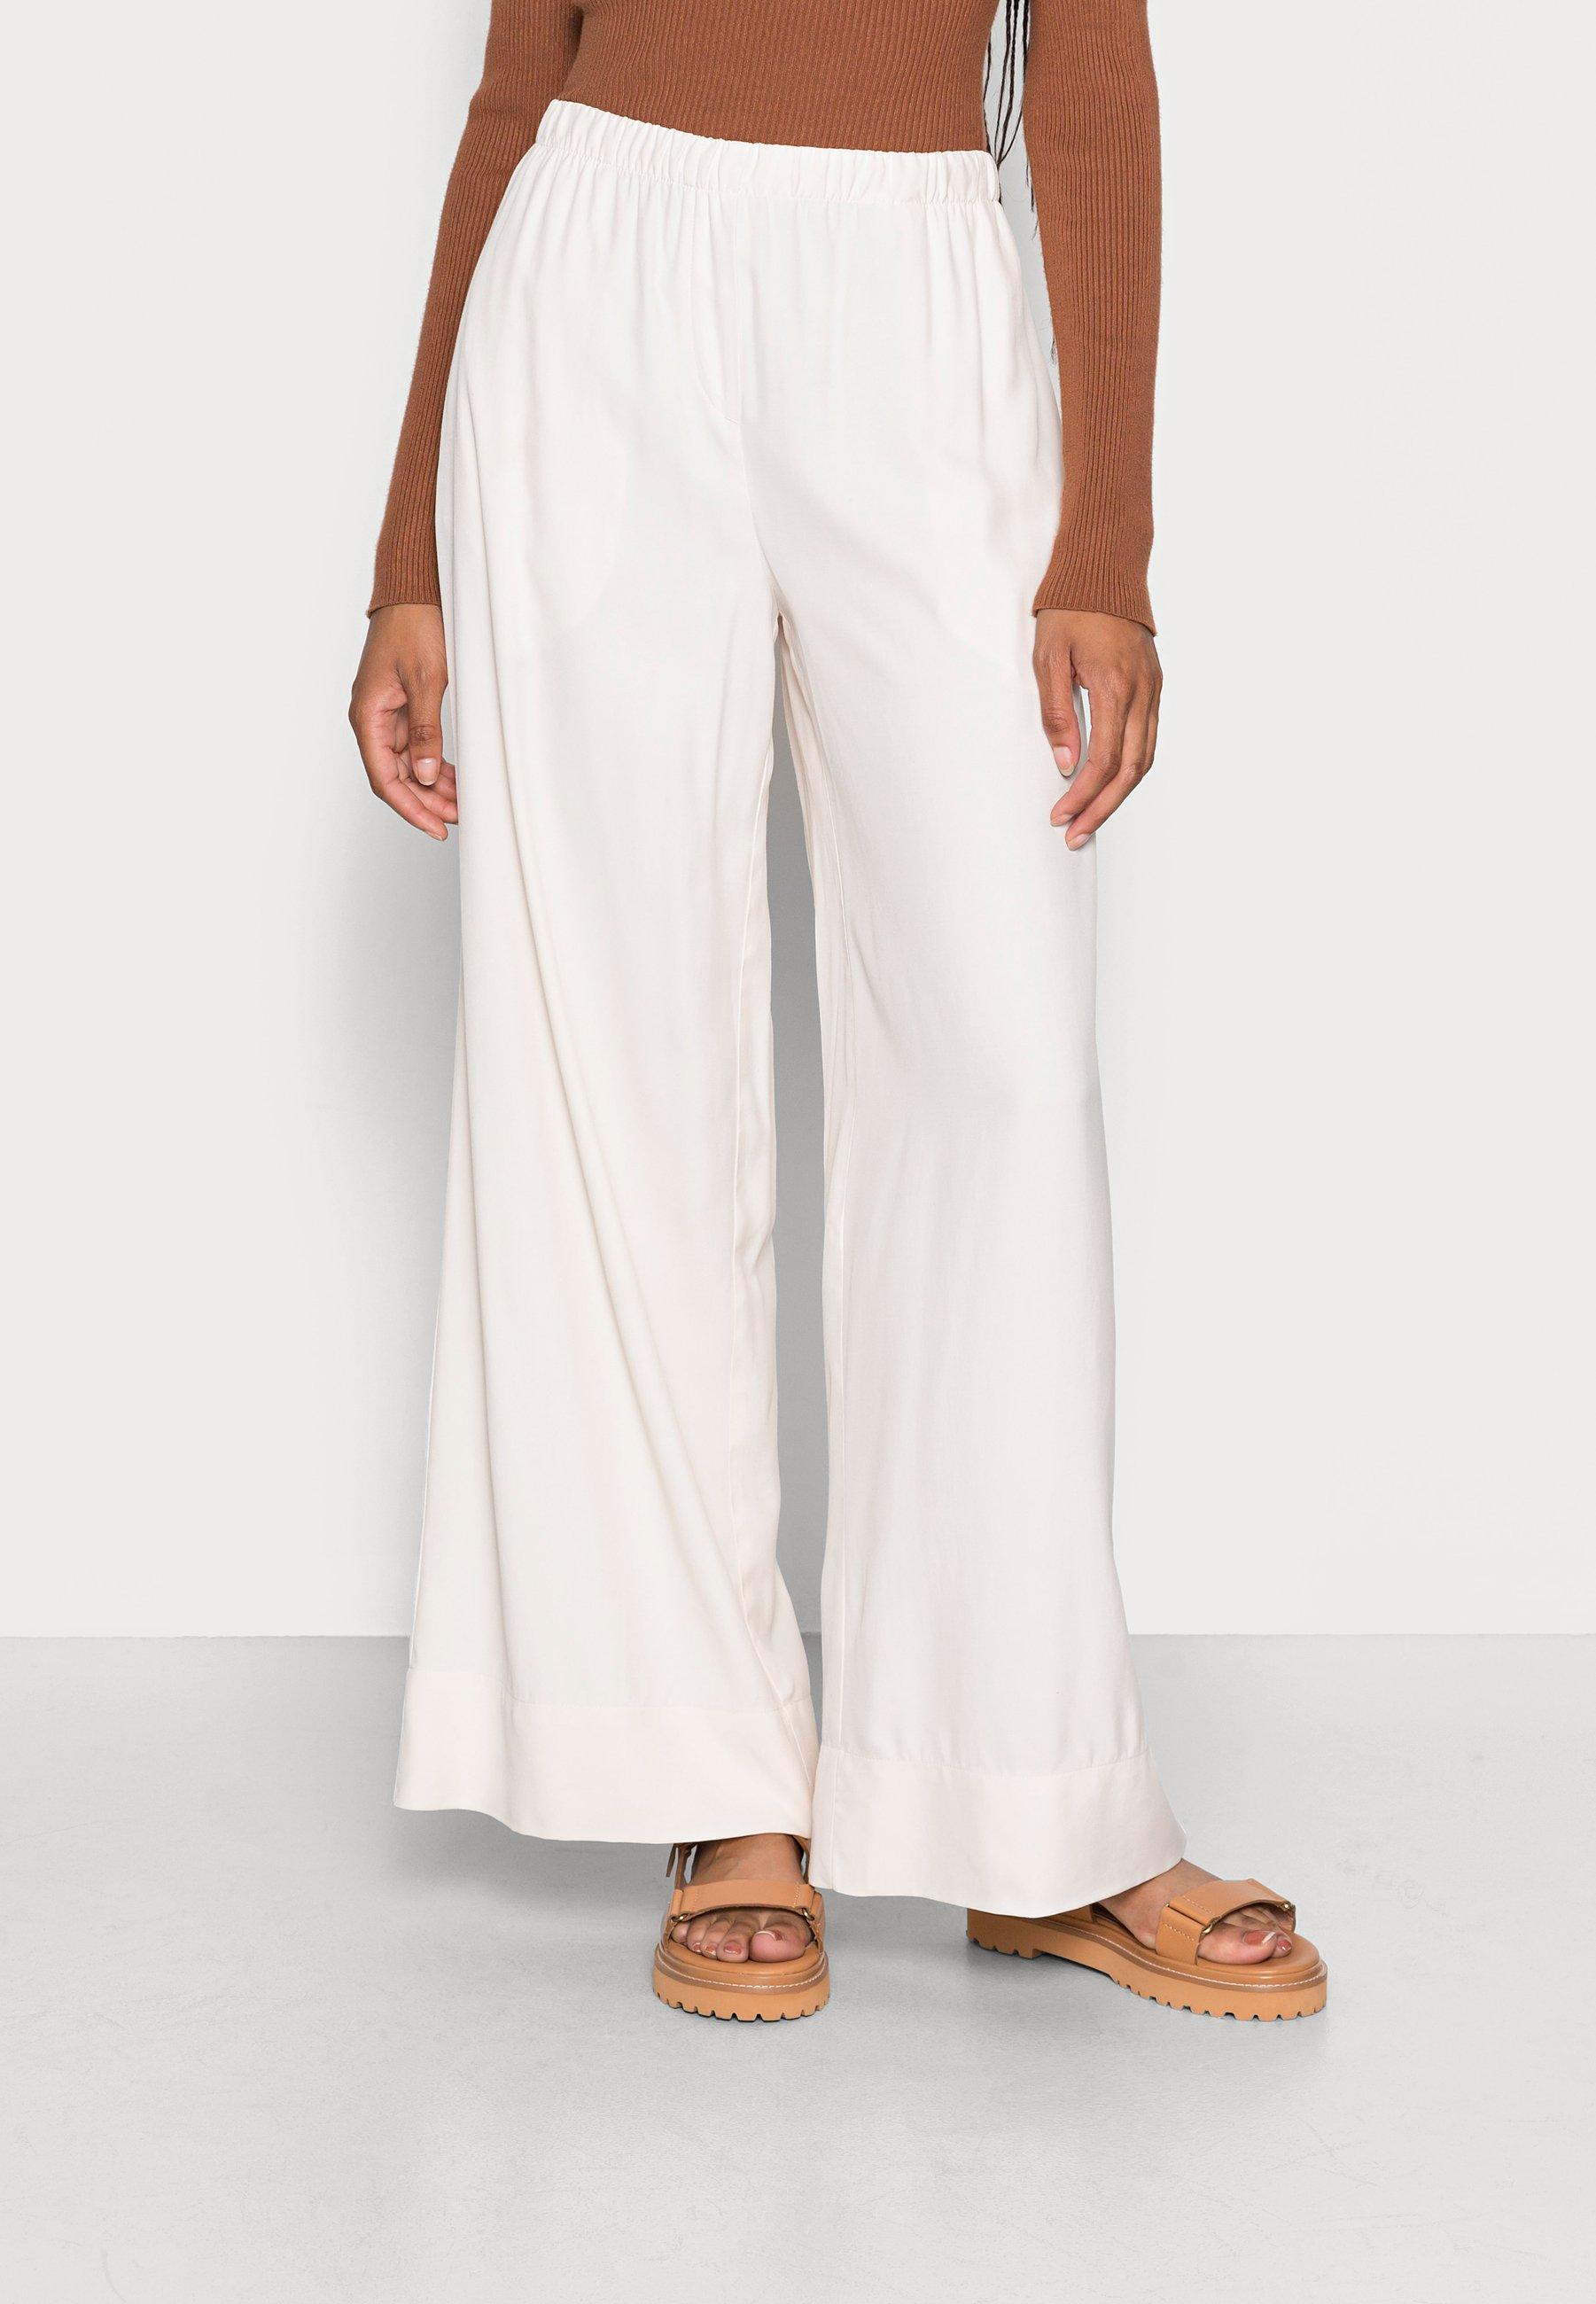 Mujer PANTS FLUENT WIDE LEG SLIM ELASTIC WAISTBAND SEAM POCKETS - Pantalones